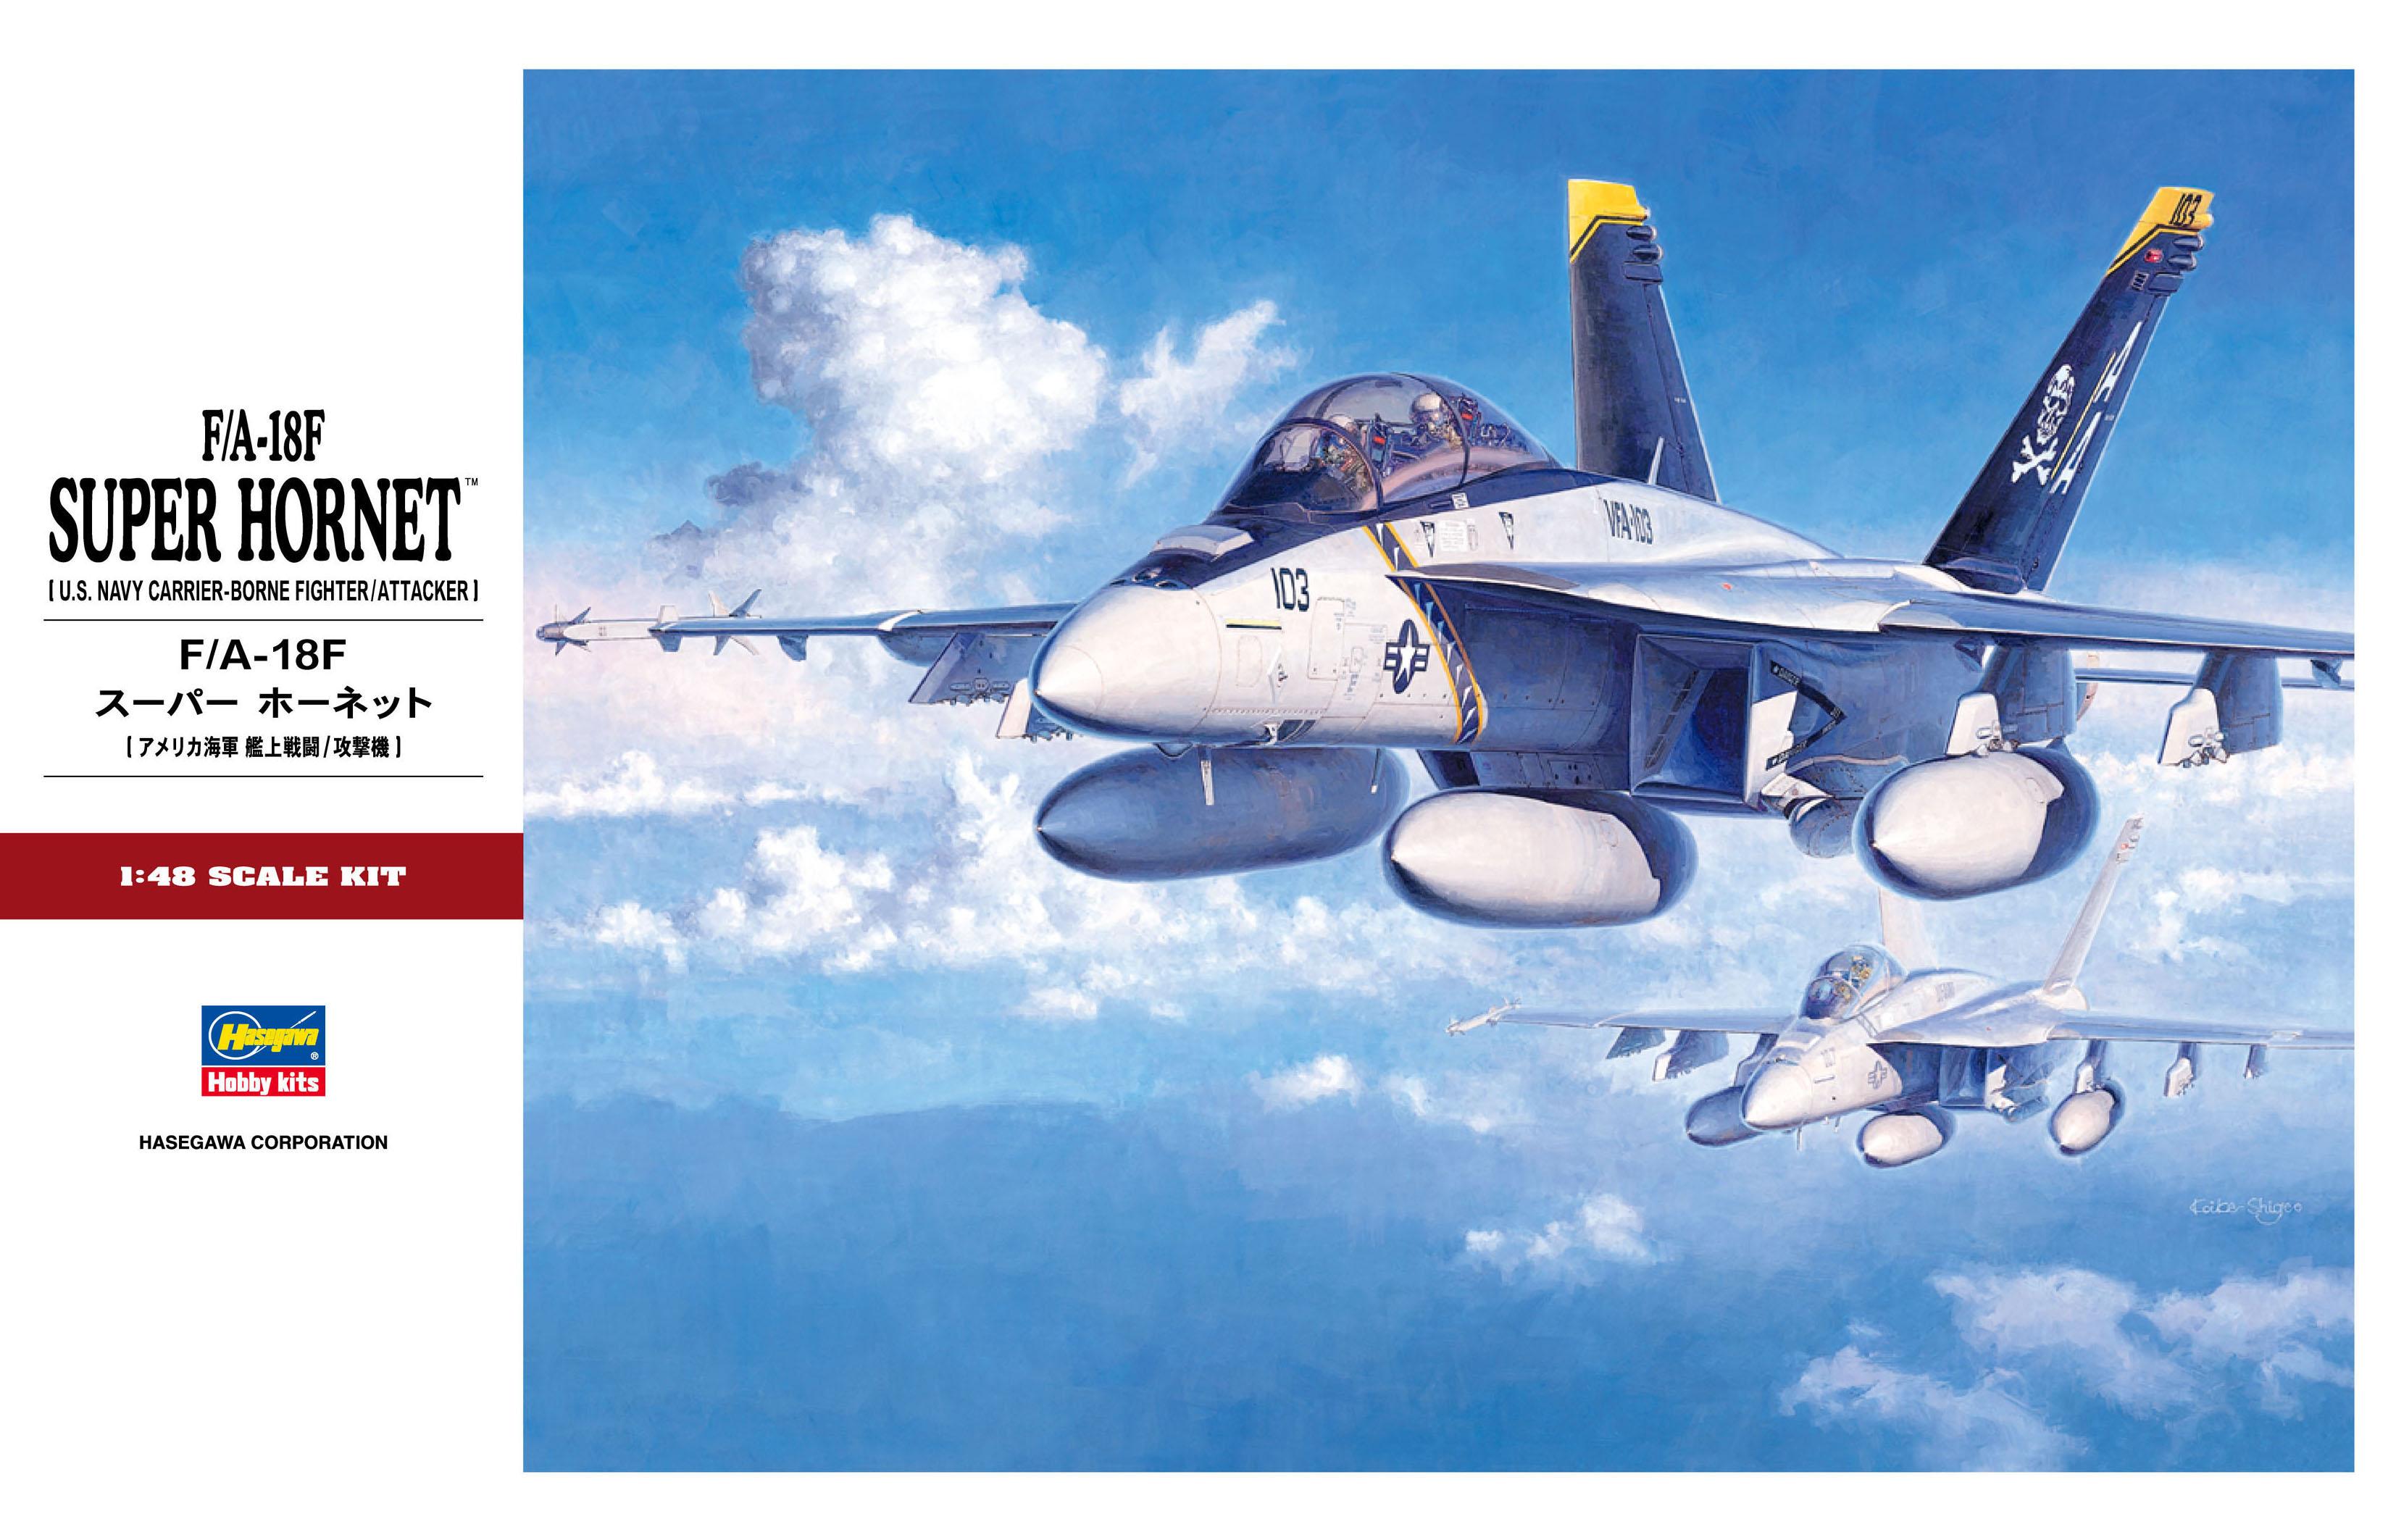 Hasegawa 1/48 F/A-18F Super Hornet